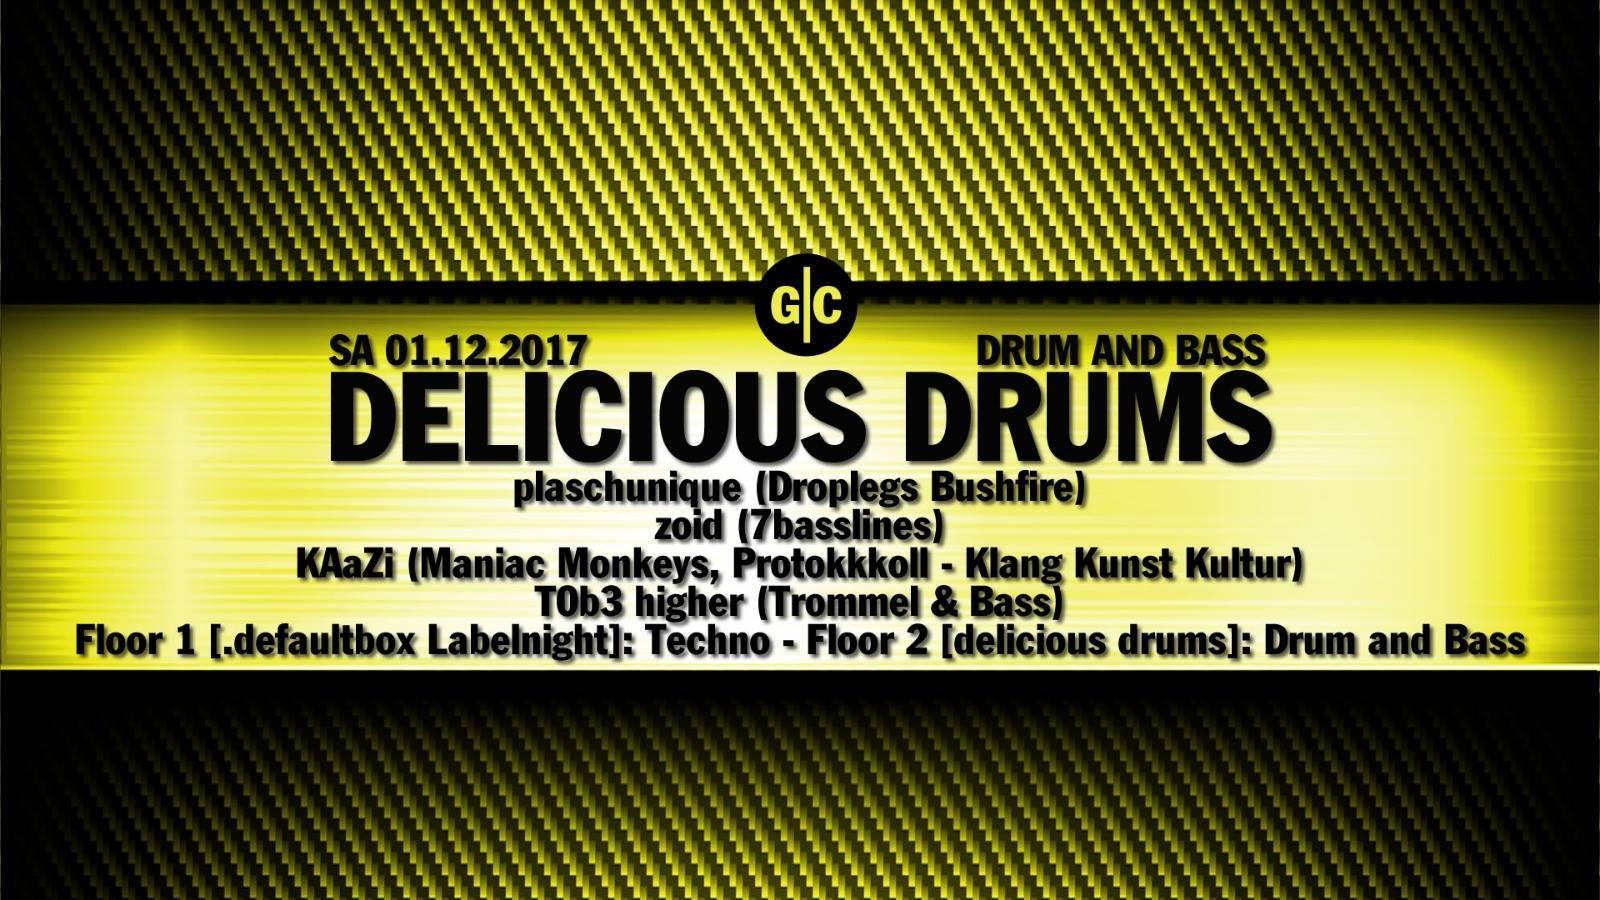 Delicious Drums w/ plaschunique, zoid, KAaZi & T0b3 higher